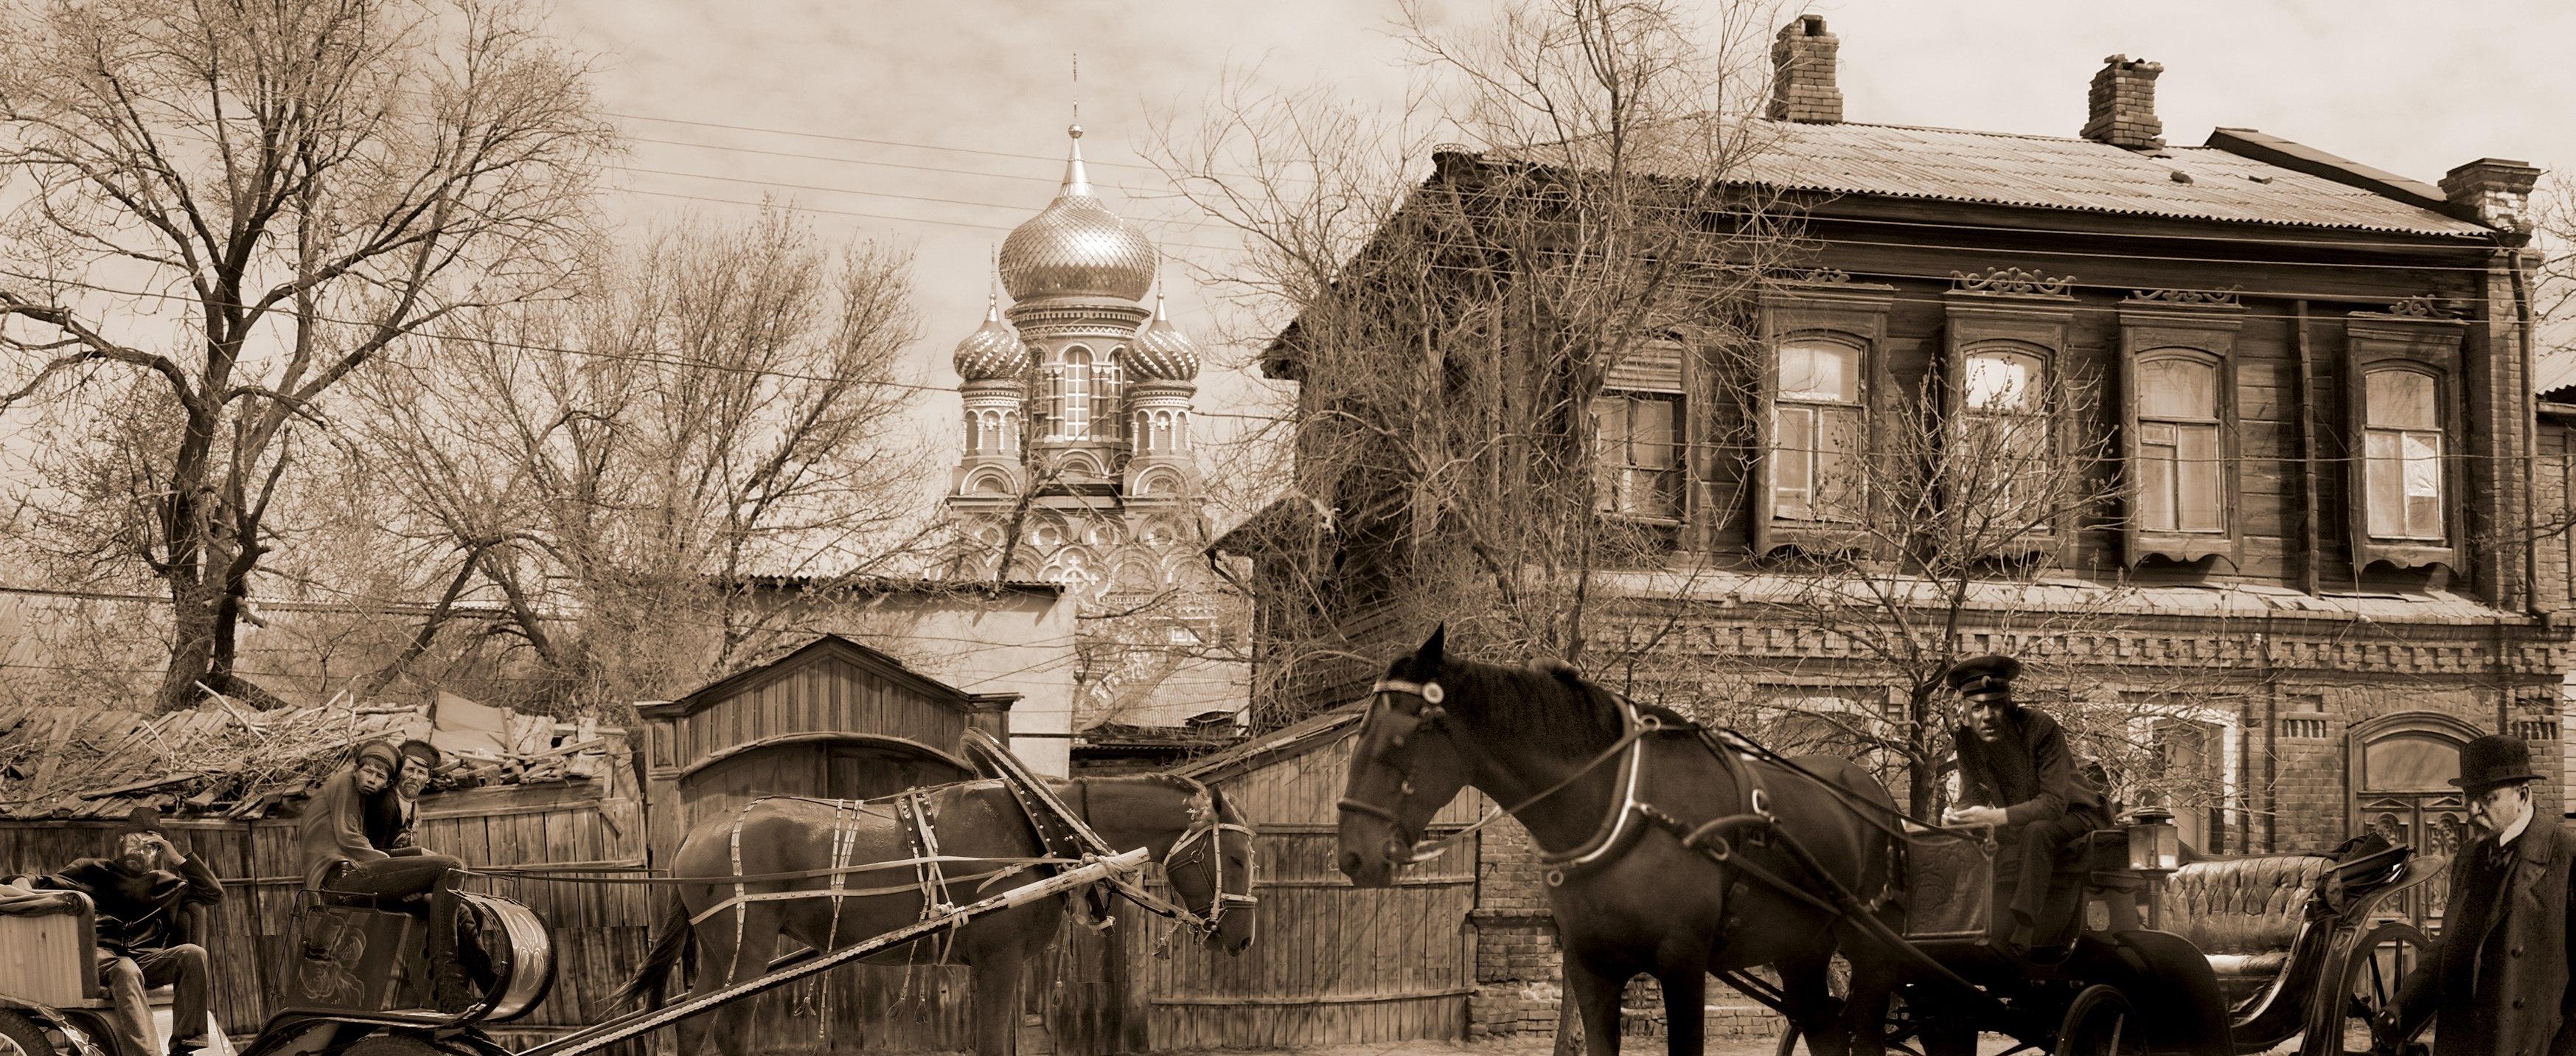 Астраханские старые дворики: www.chitalnya.ru/contest/74/2160